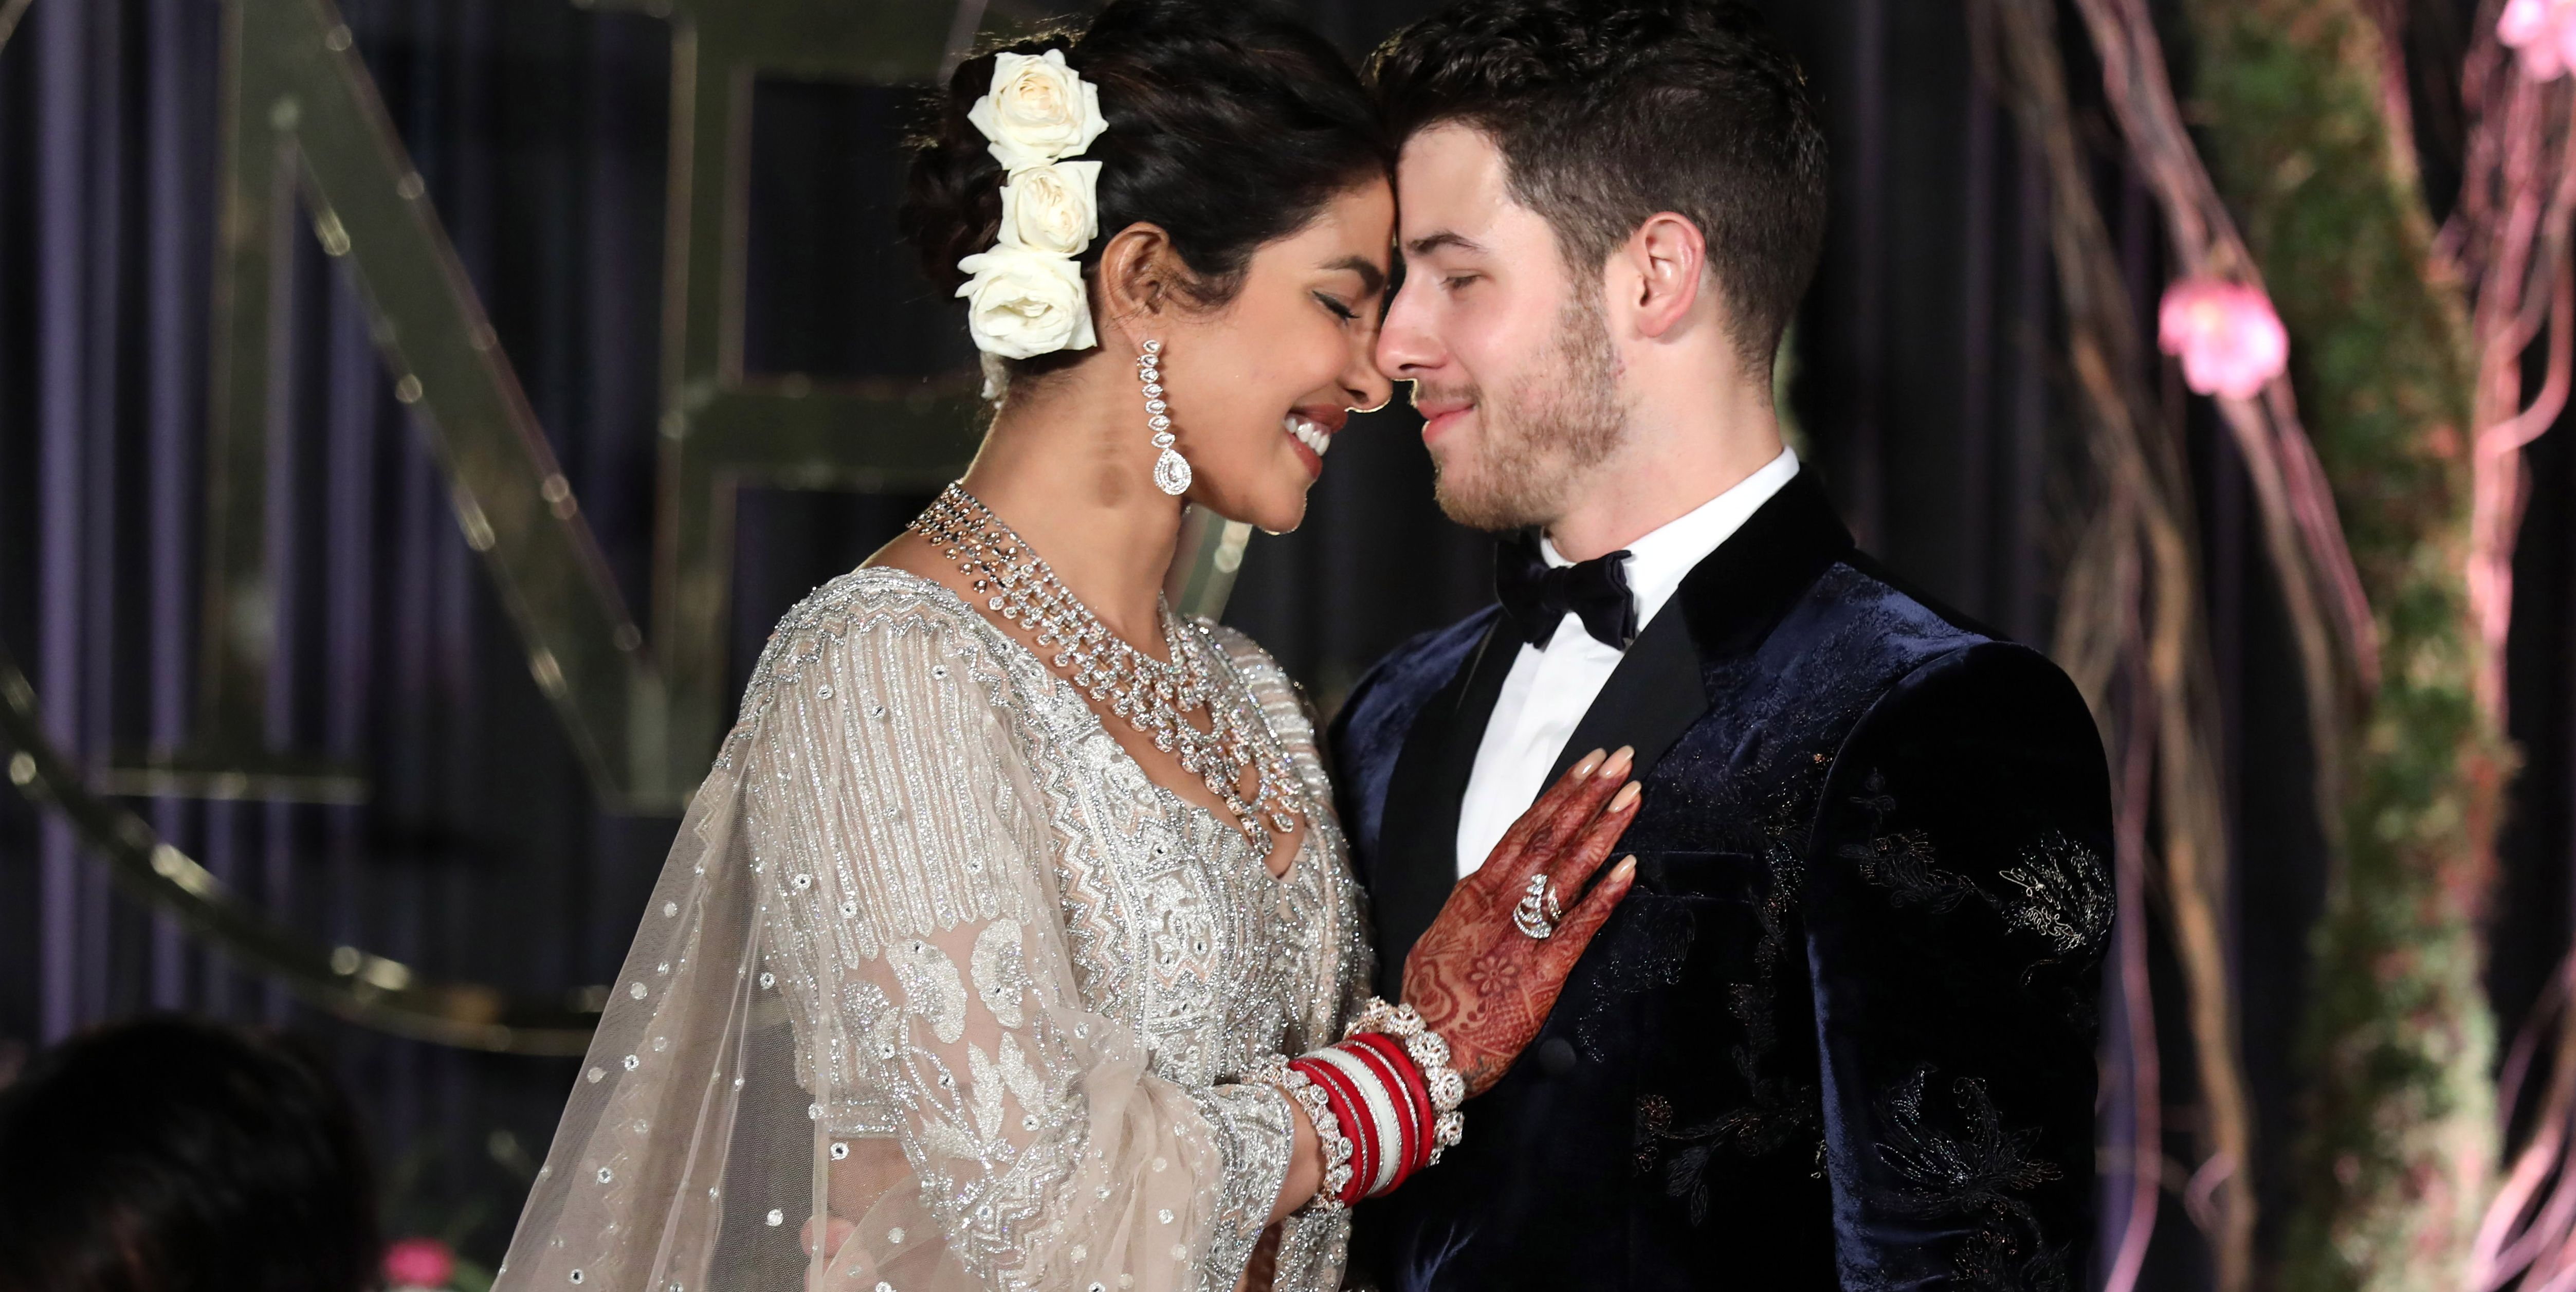 As an Indian Bride-to-Be, Seeing Priyanka Chopra and Nick Jonas Break Tradition Took My Wedding Stress Away